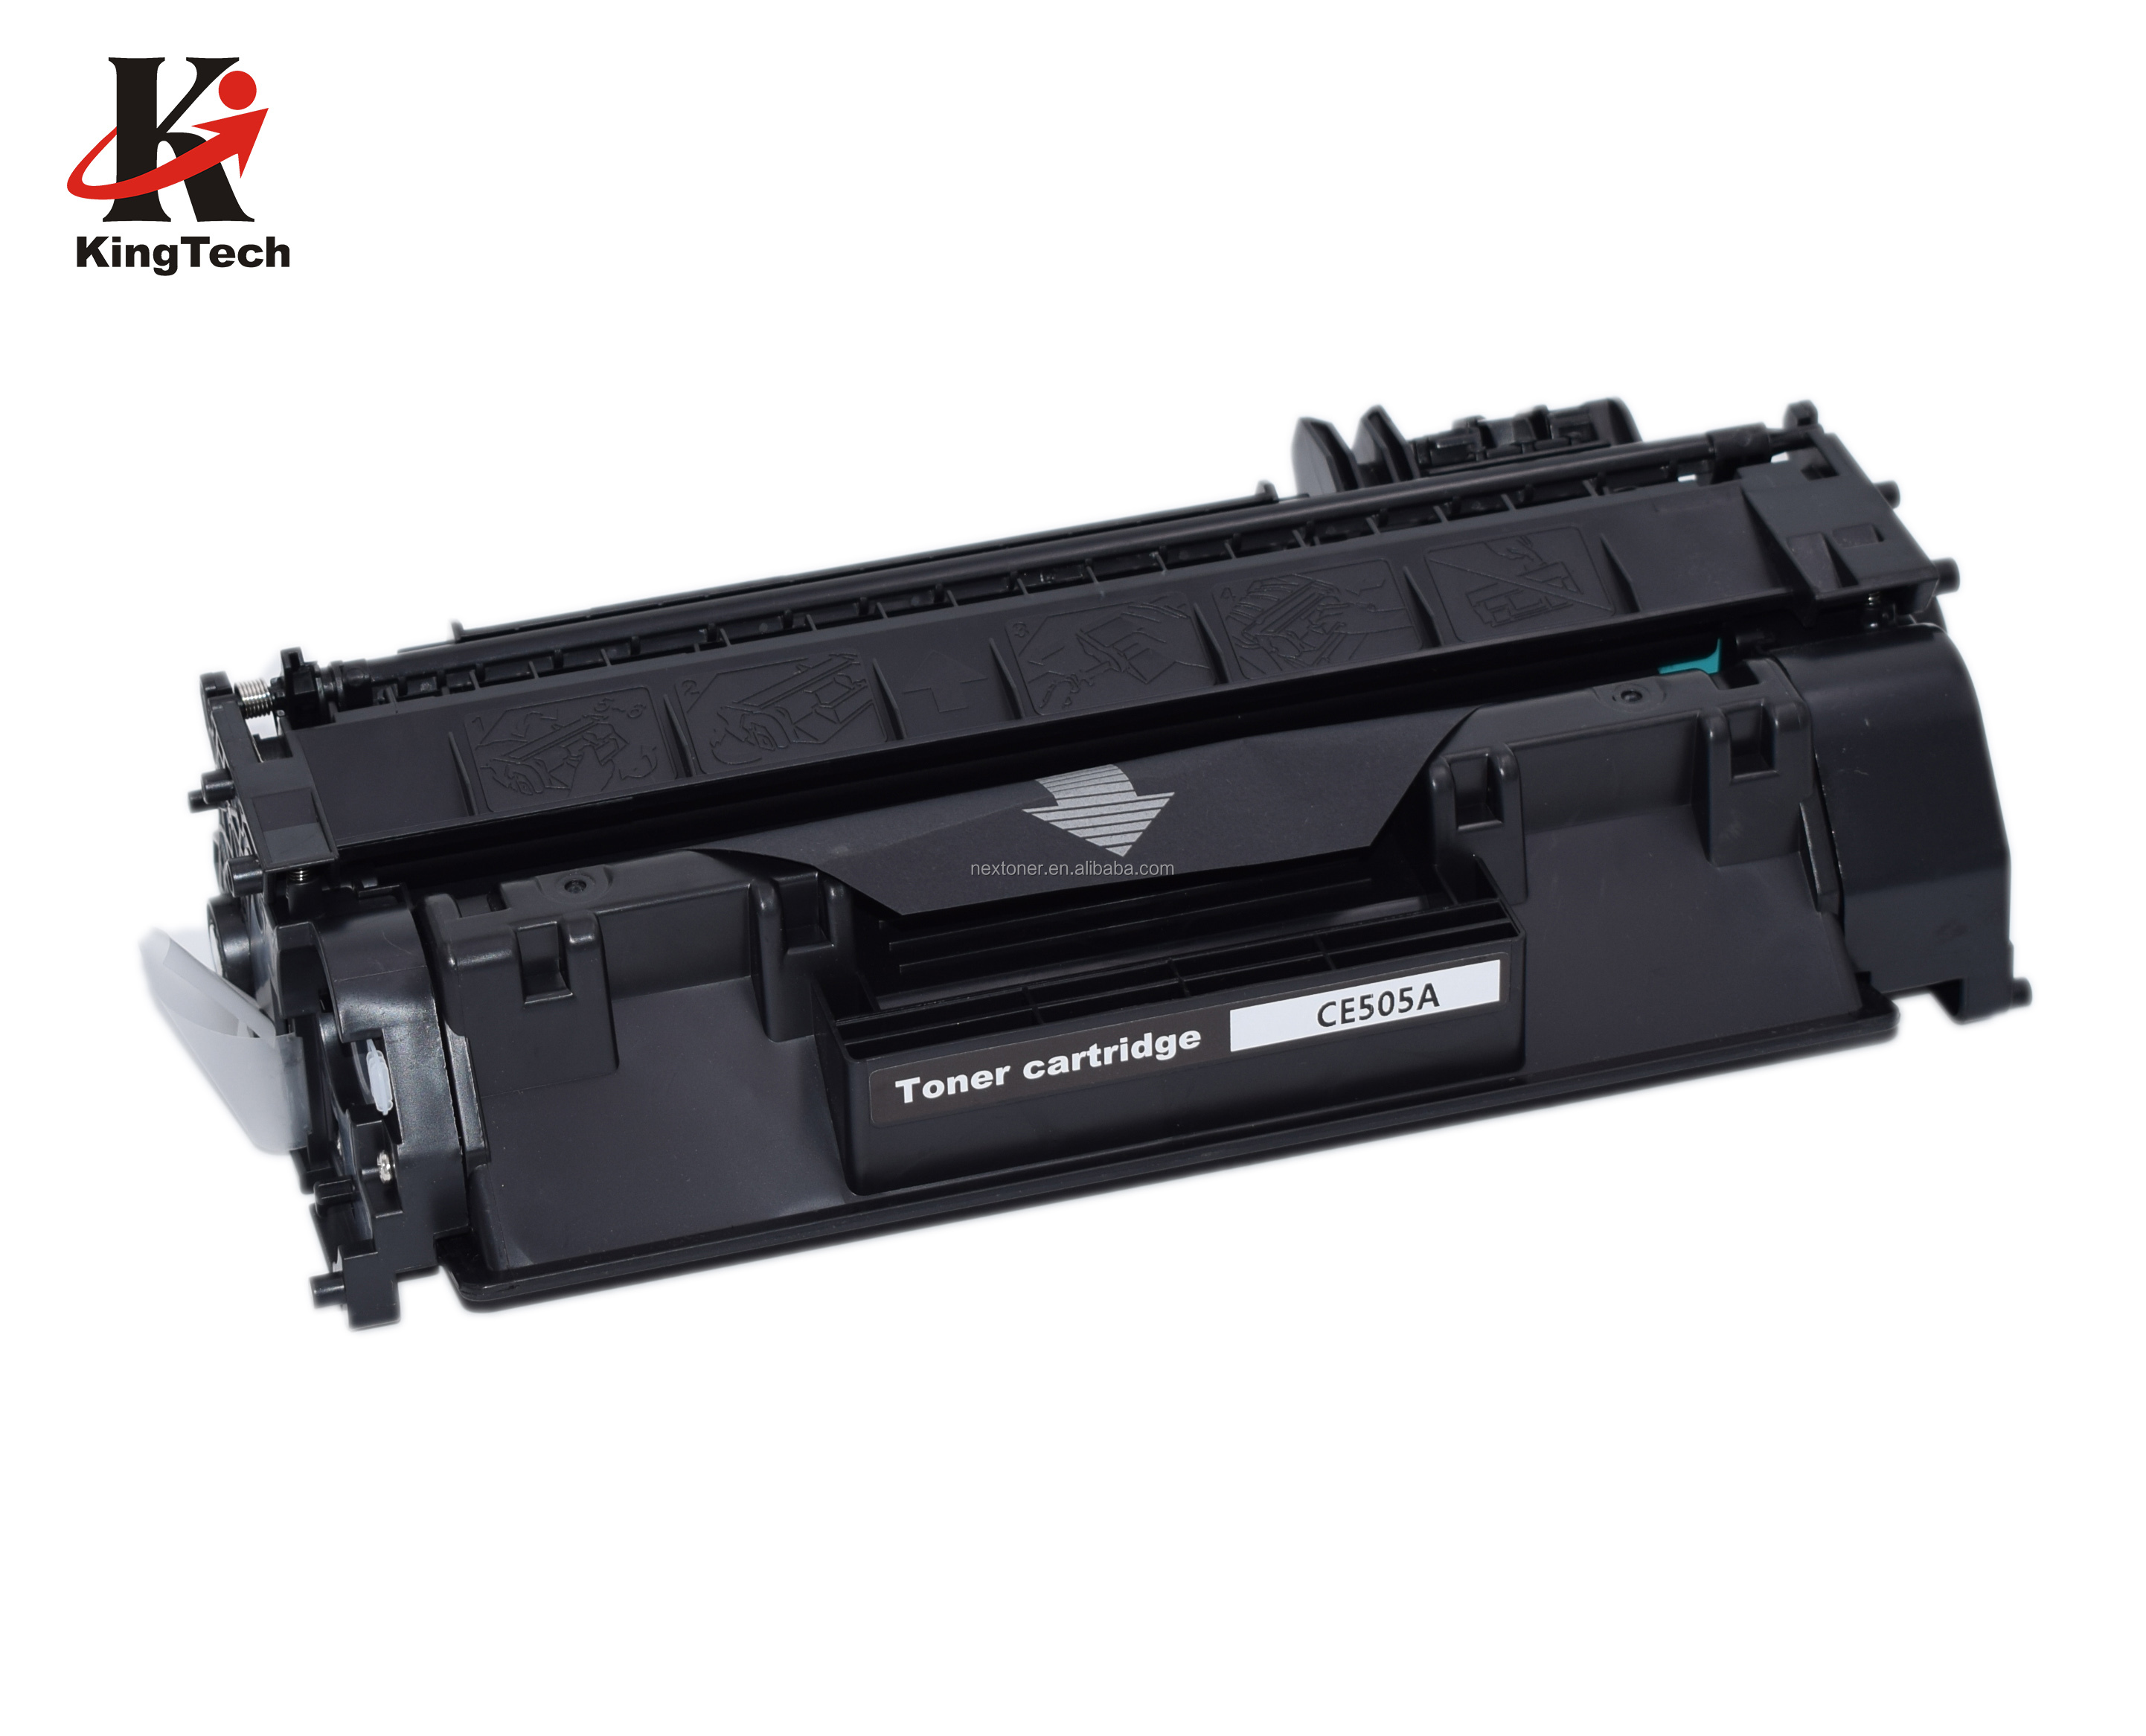 China Print Toner Hp Manufacturers And 43x High Yield Black Original Laserjet Cartridge C8543x Suppliers On Alibabacom